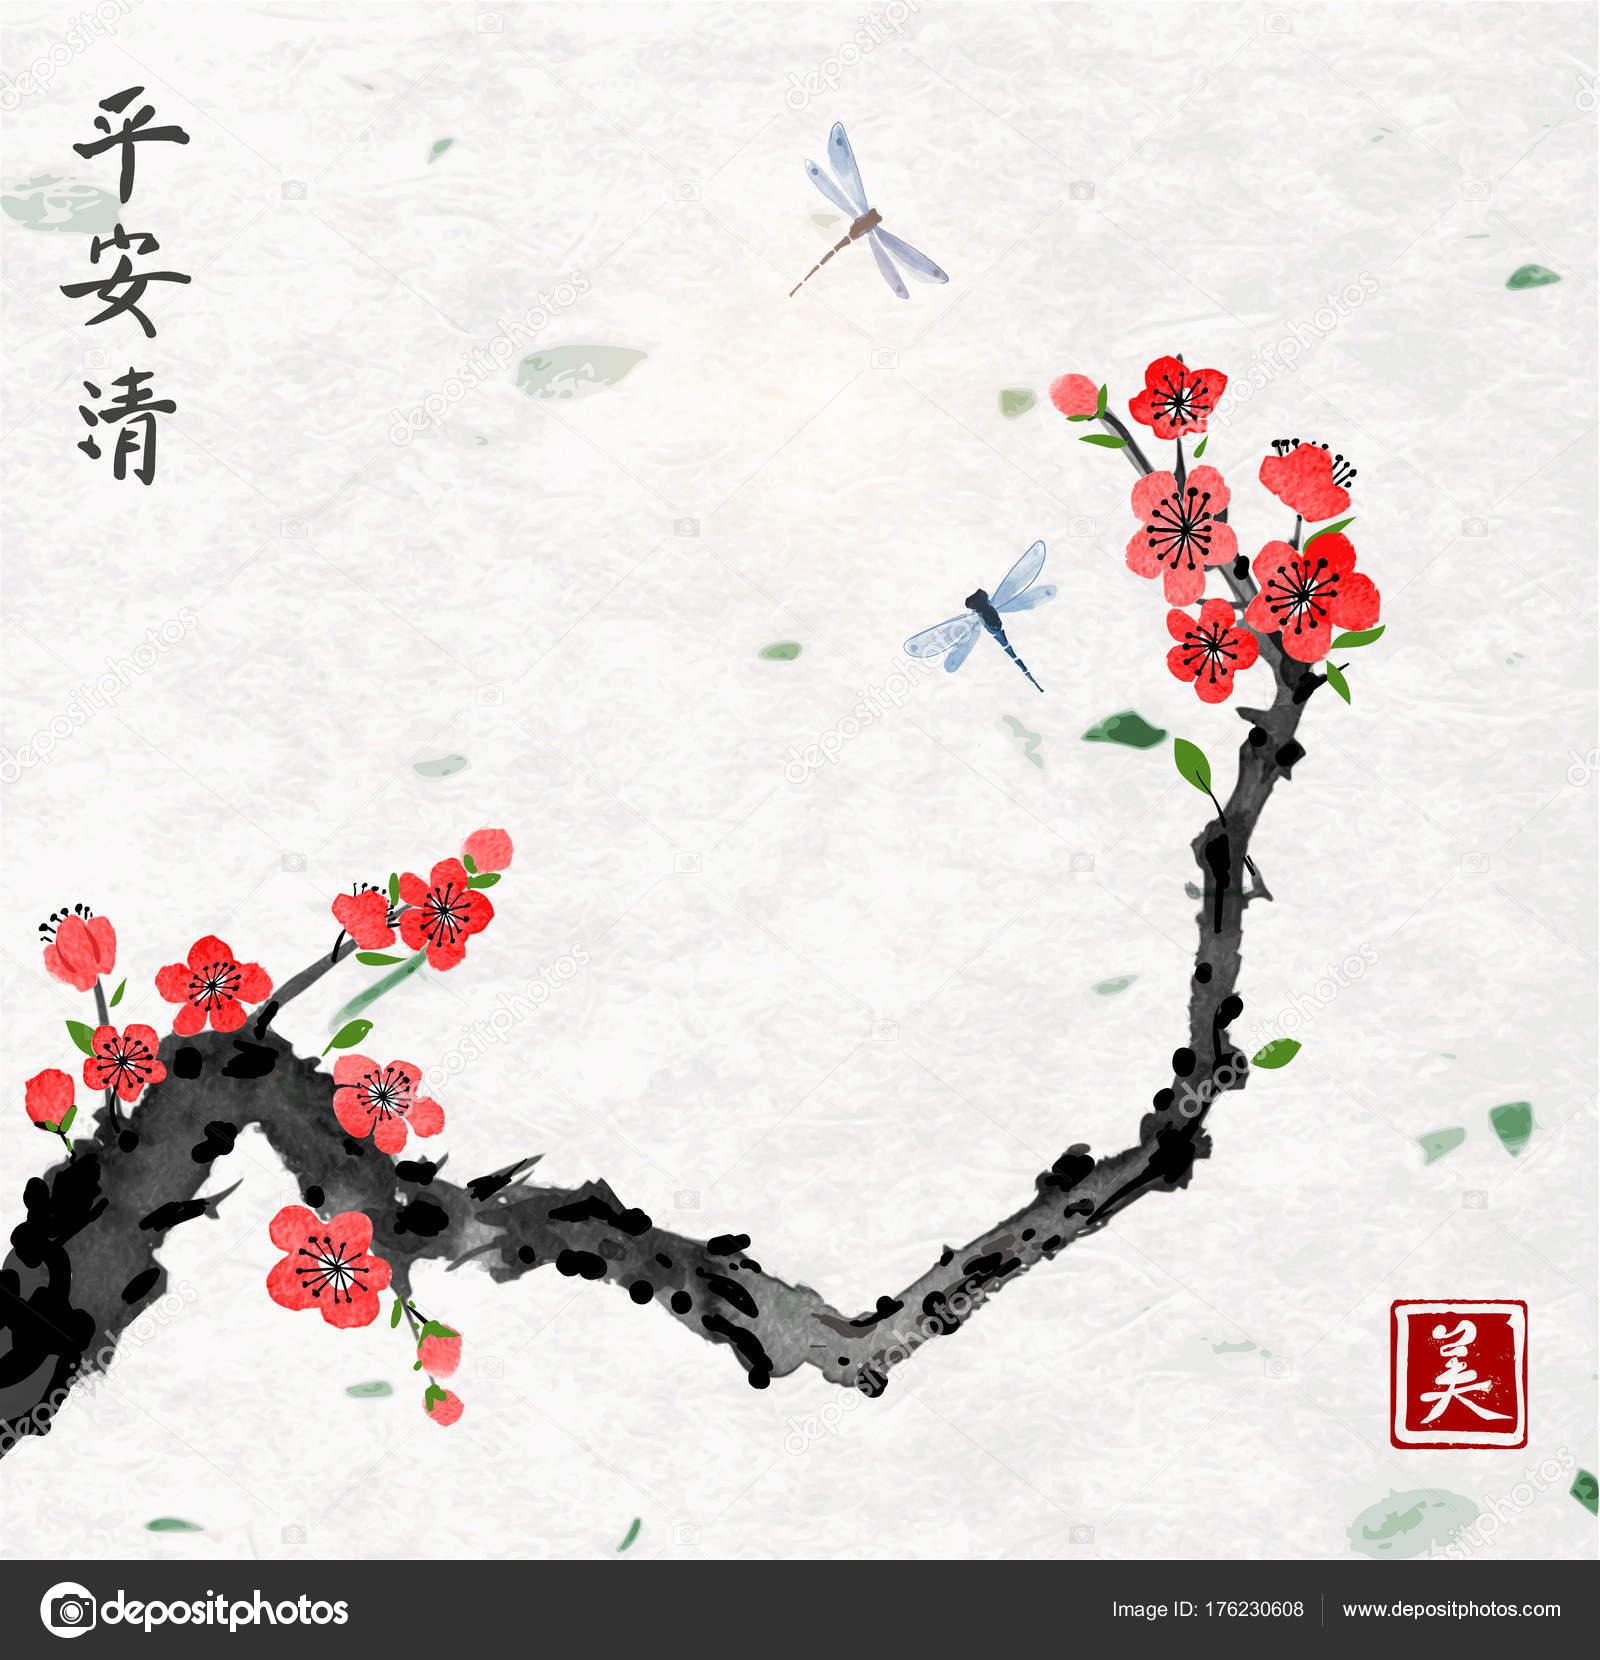 çam Ağacı Sakura çiçeği Dallarda Oturan Siyah Kuş Pirinç Kağıdı